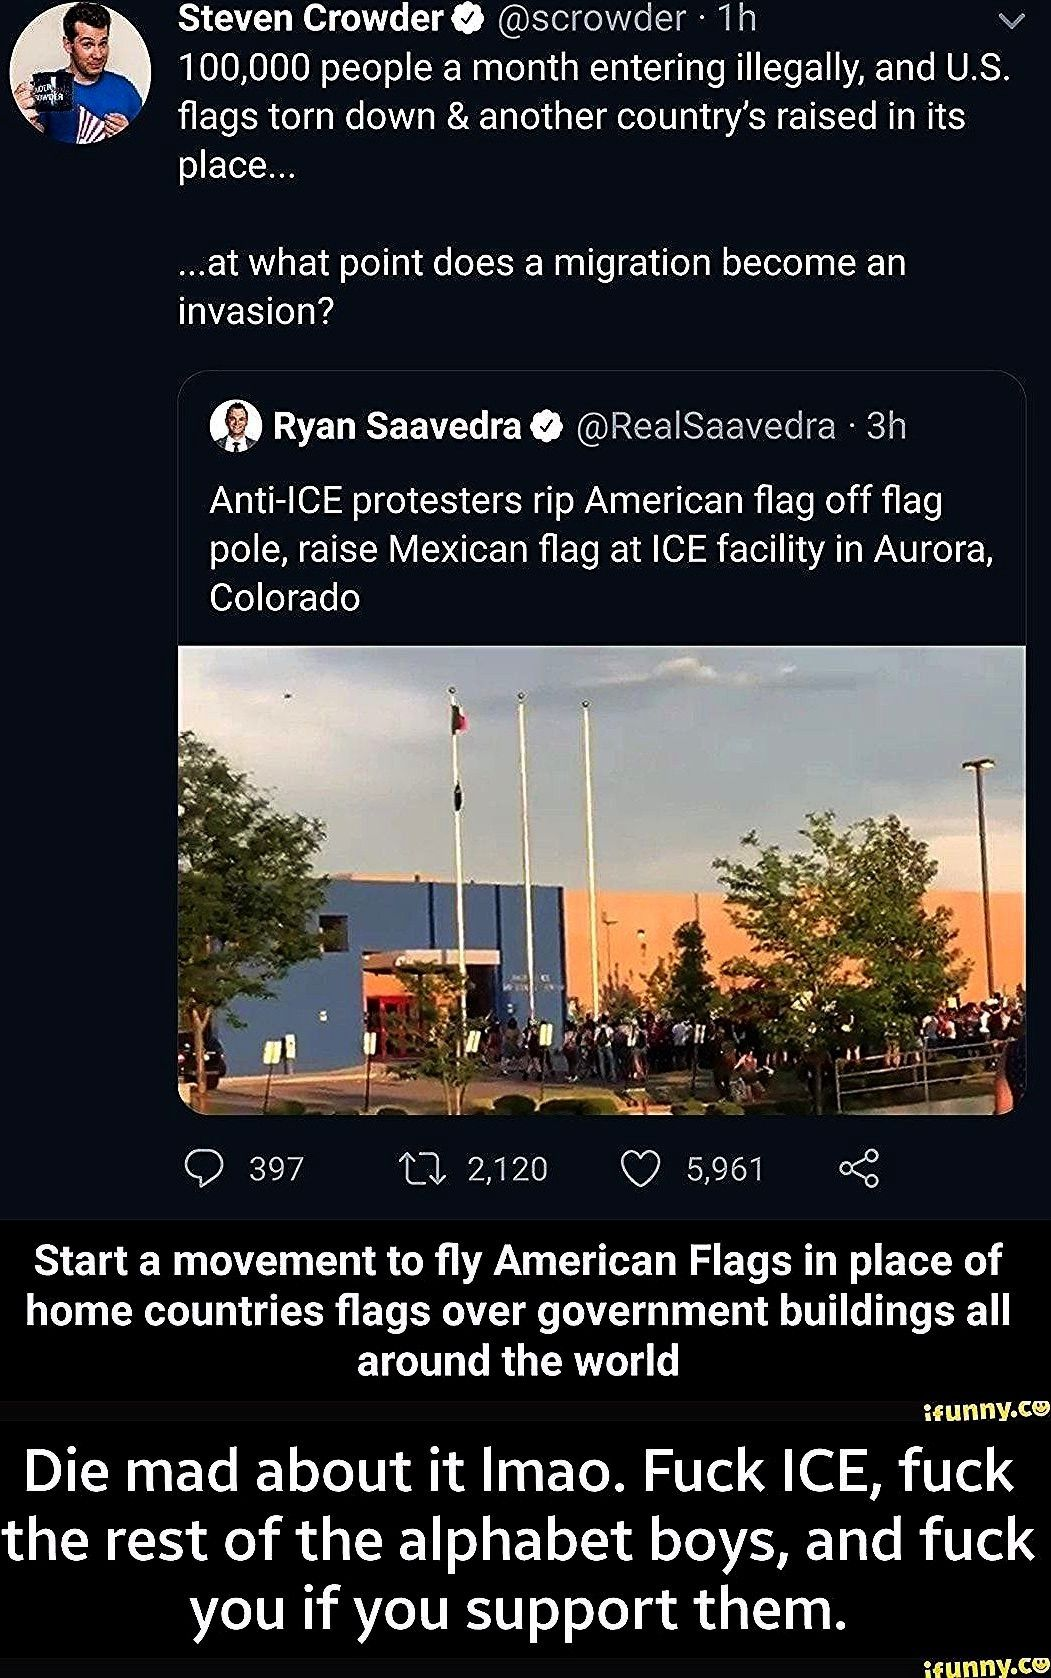 Stevenuniverse Realsaavedra Animemanga Migration Illegally Movement American Scrowder Crowdero Saavedra Countrys Invas In 2020 Tear Down American Flag Torn